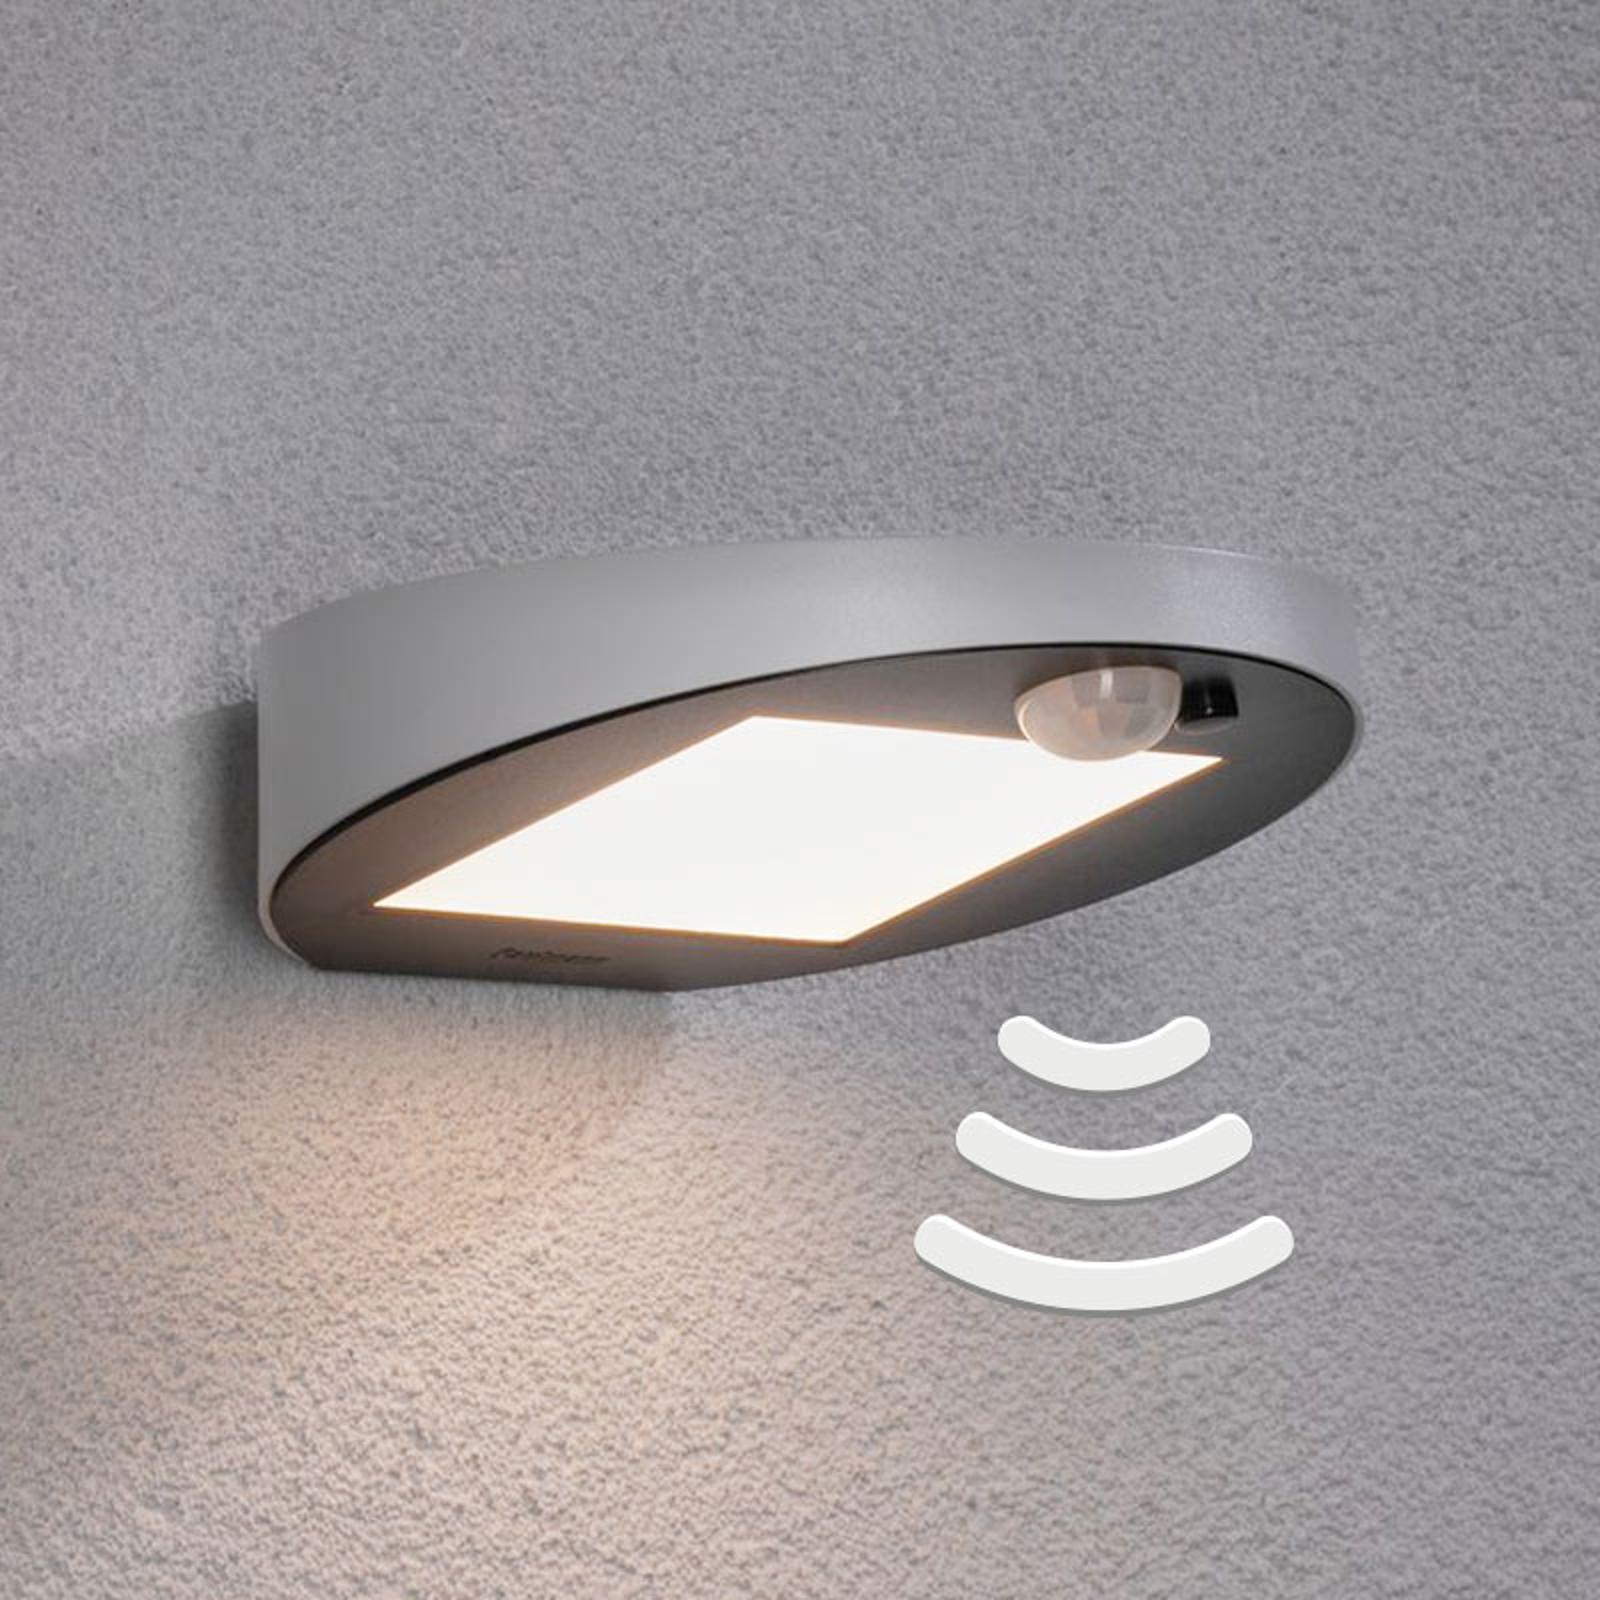 Paulmann LED-væglampe med solcelle Ryse, hvid